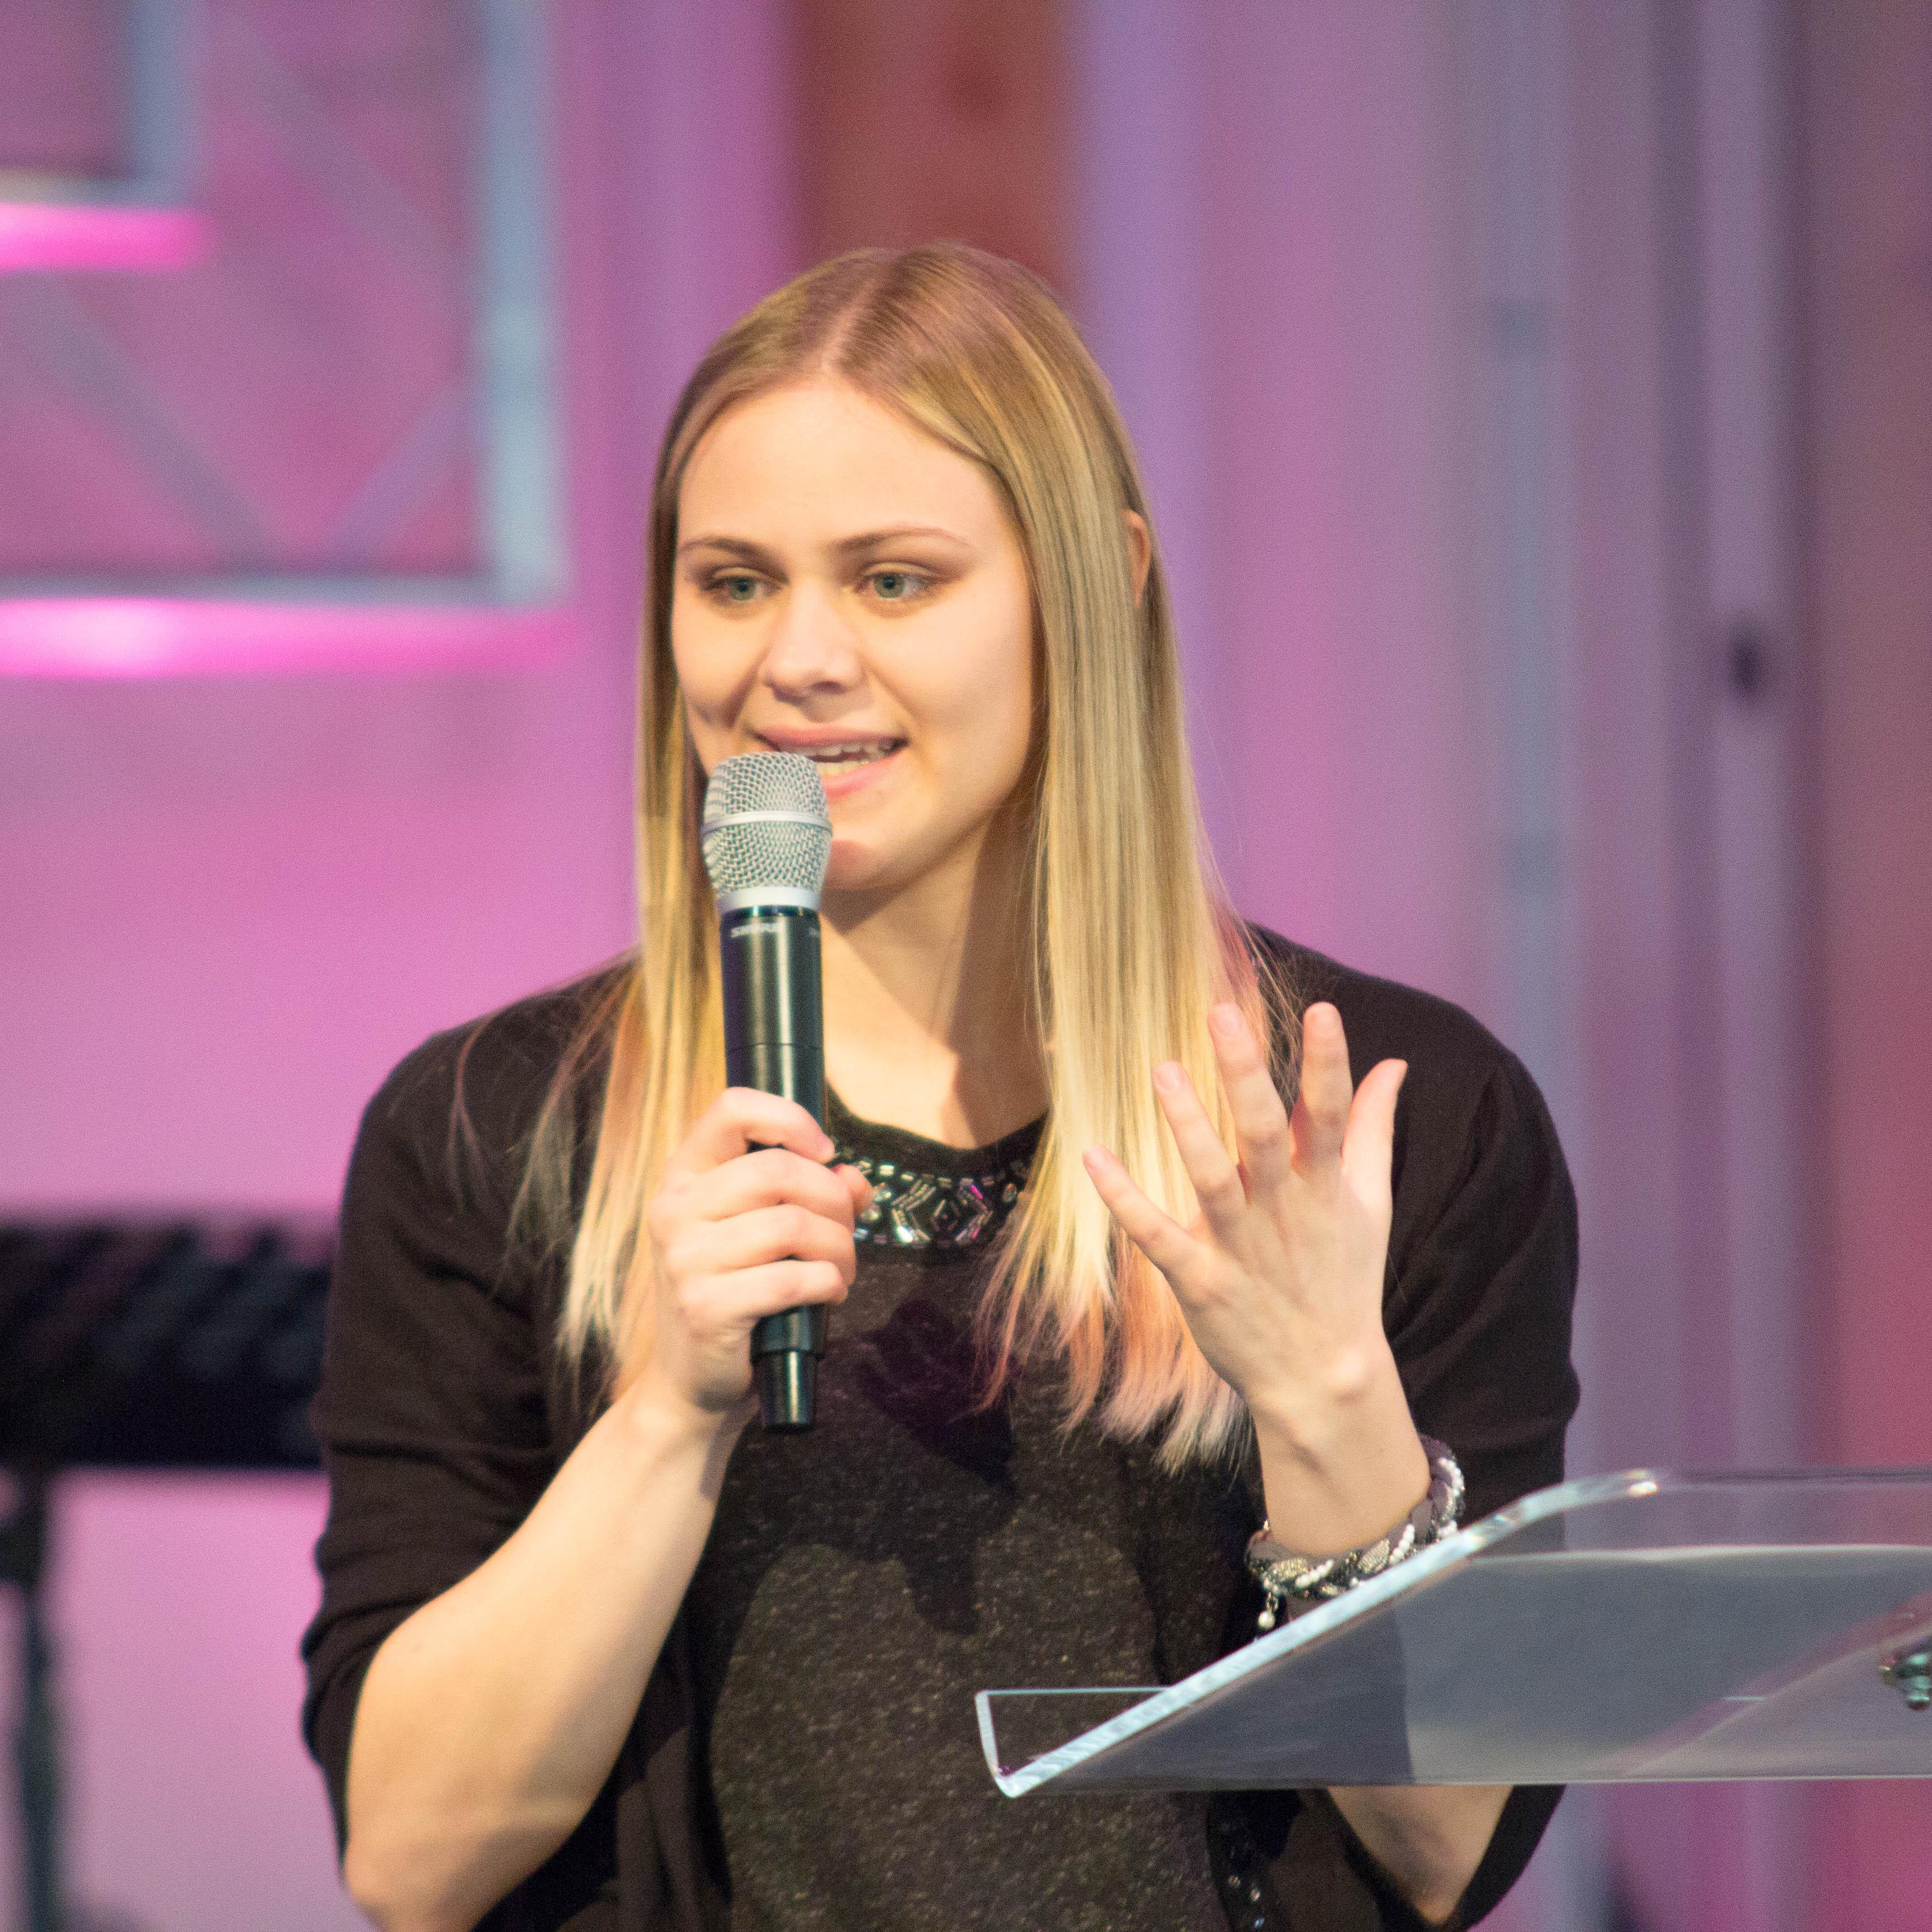 Katharina Molleker